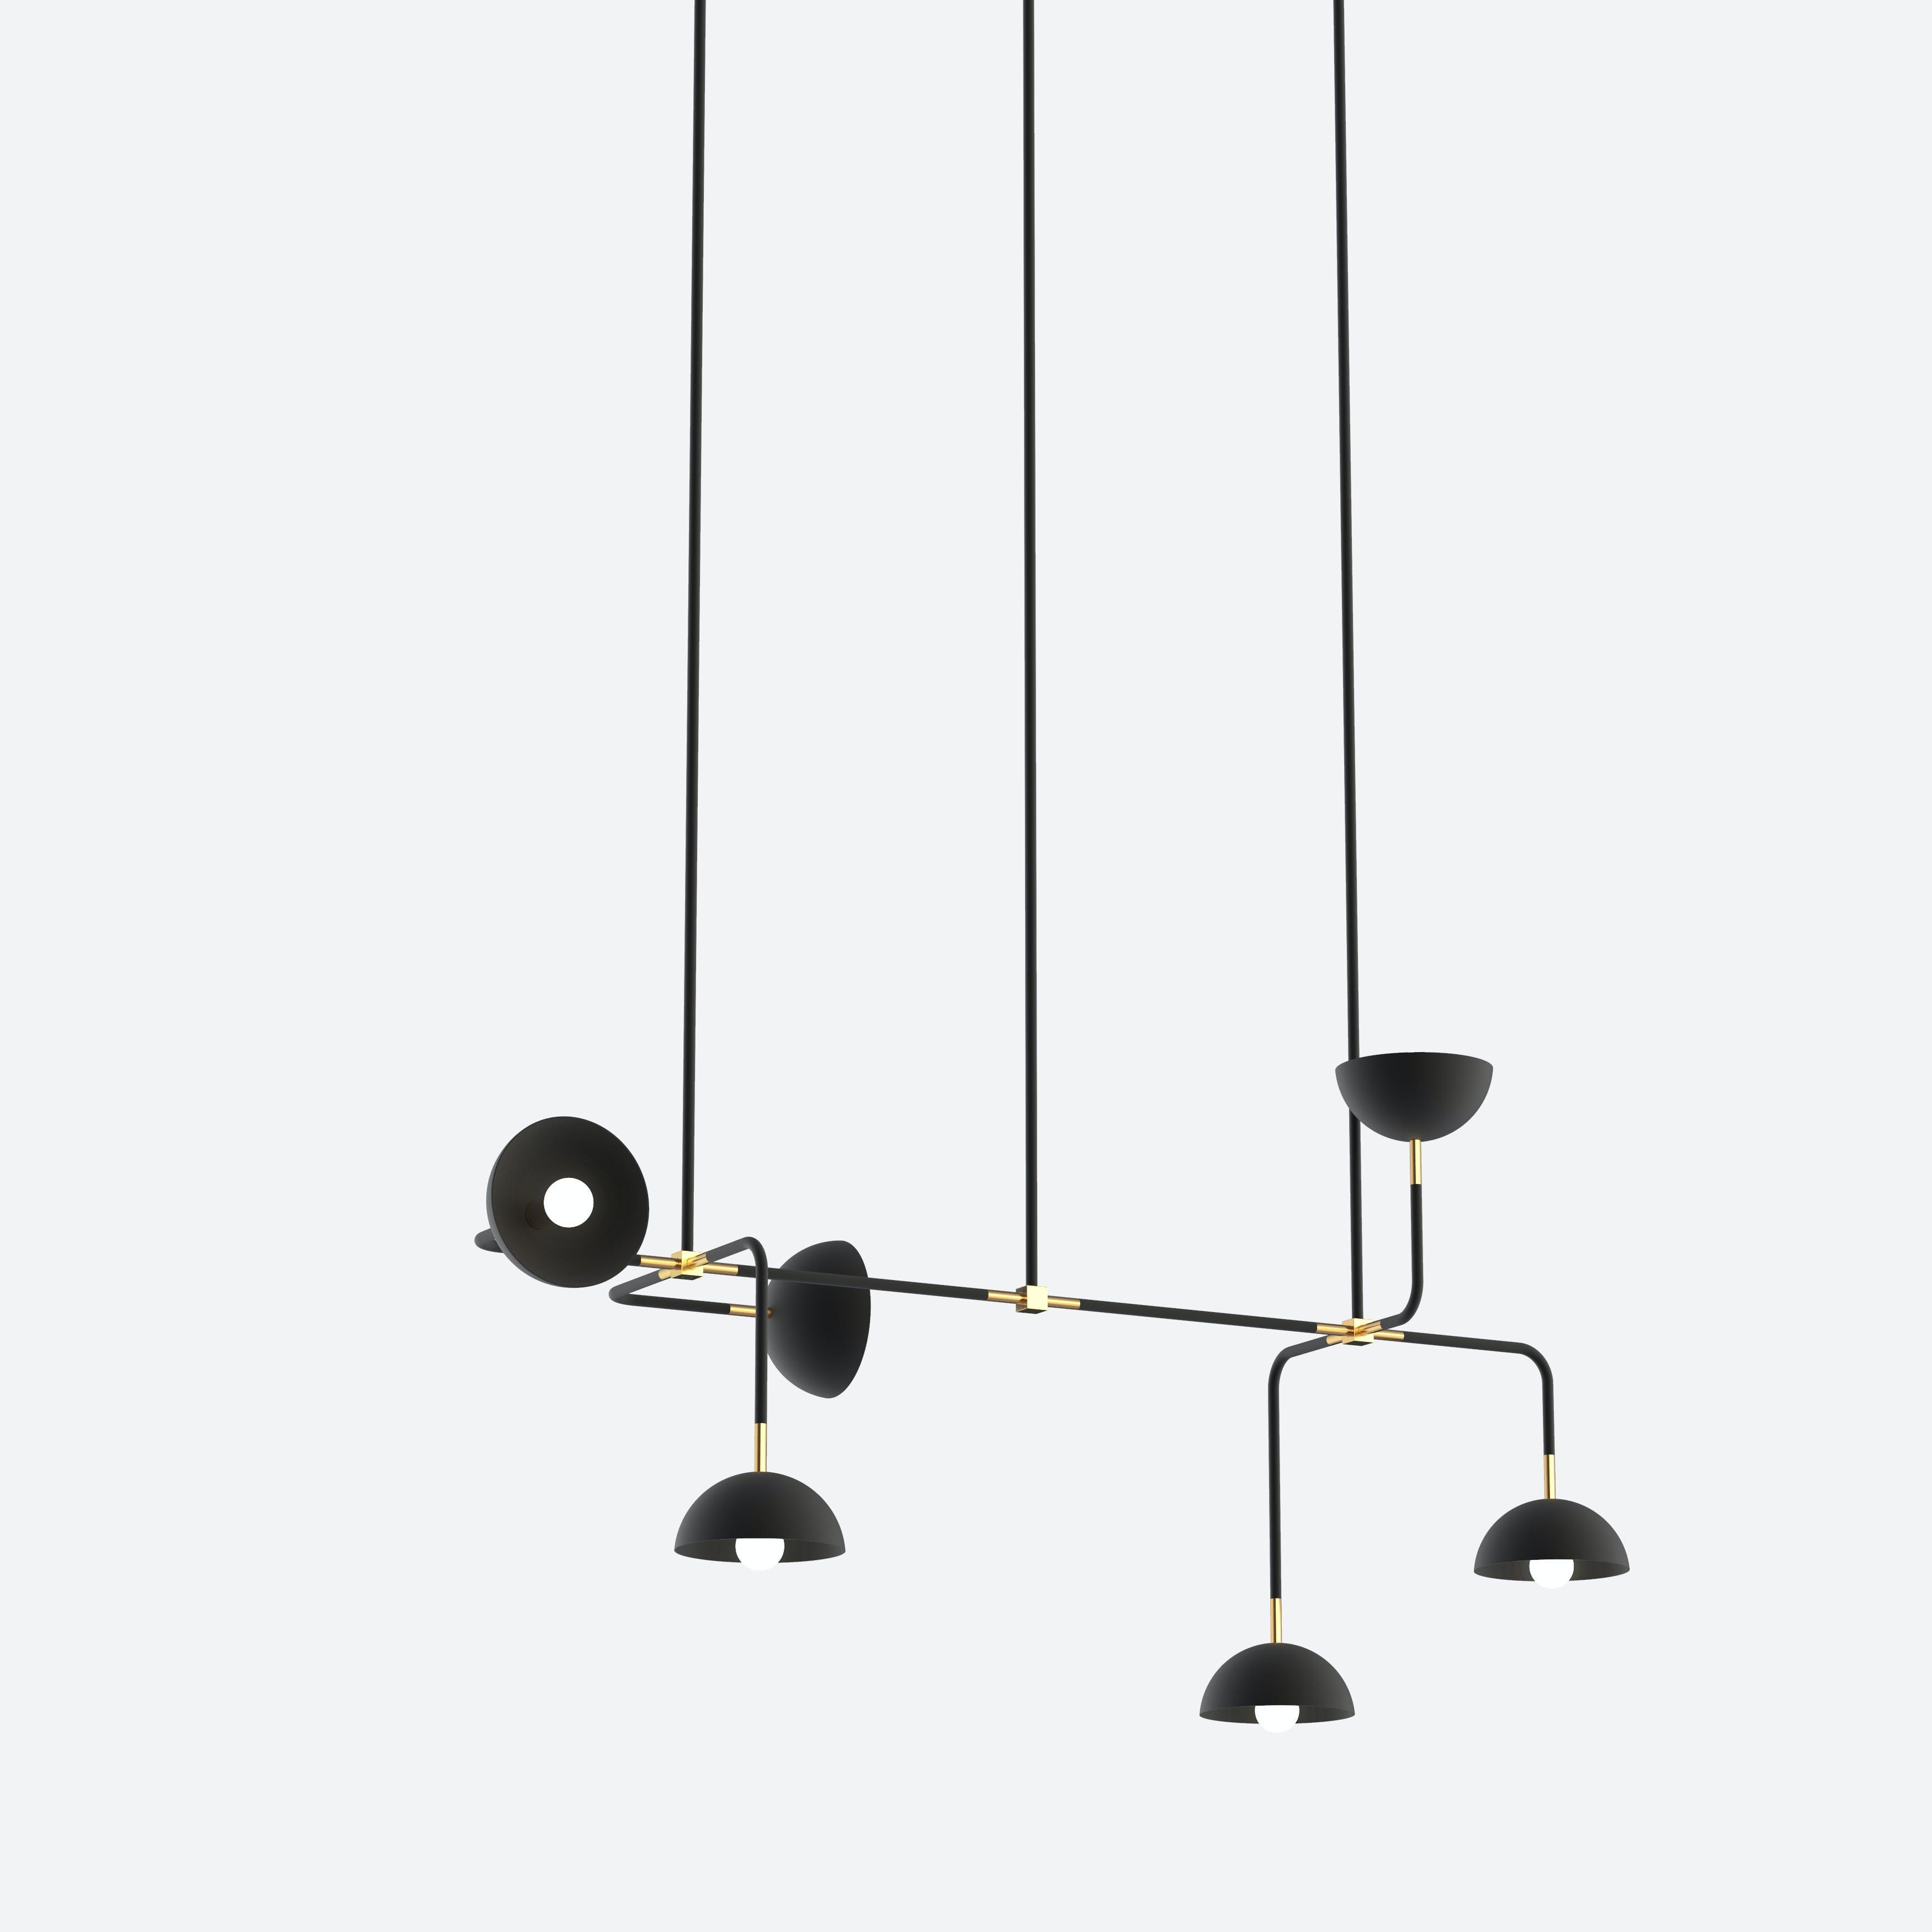 lambert & fils beaubien 08 hanging lamp haute living